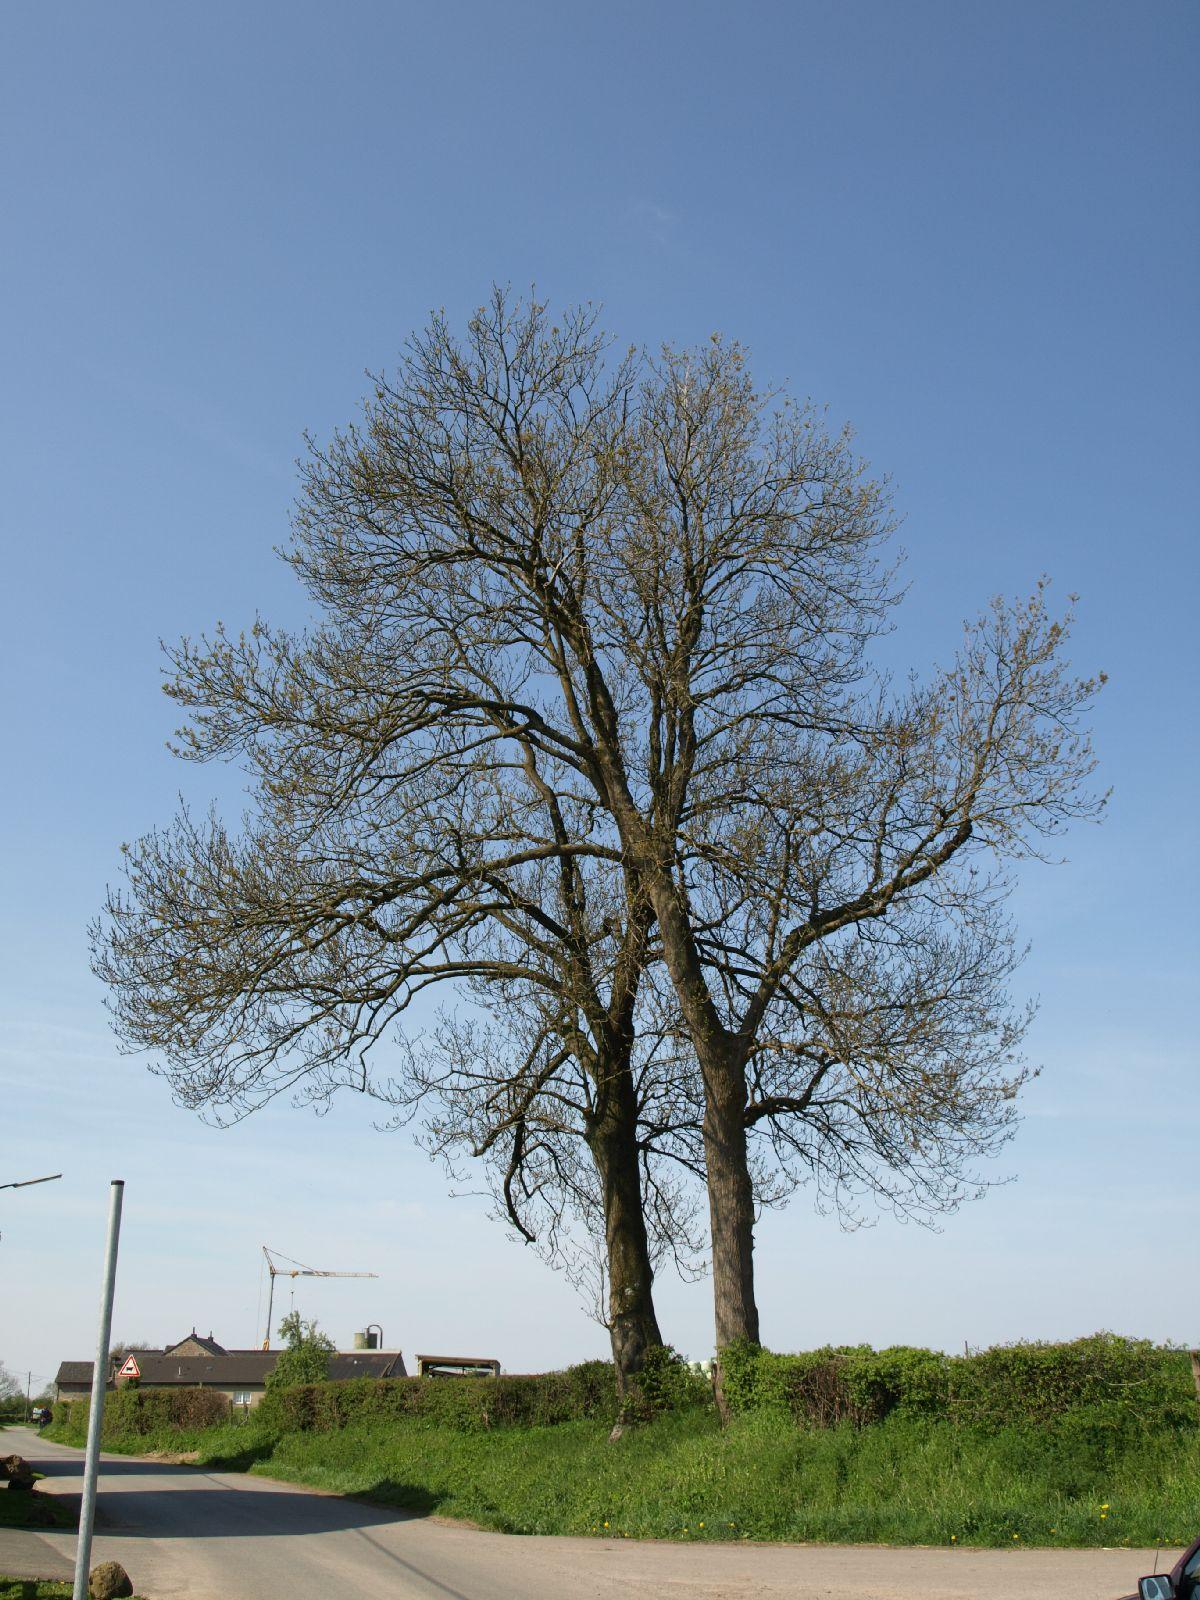 Pflanzen-Baum-Foto_Textur_B_P5042410